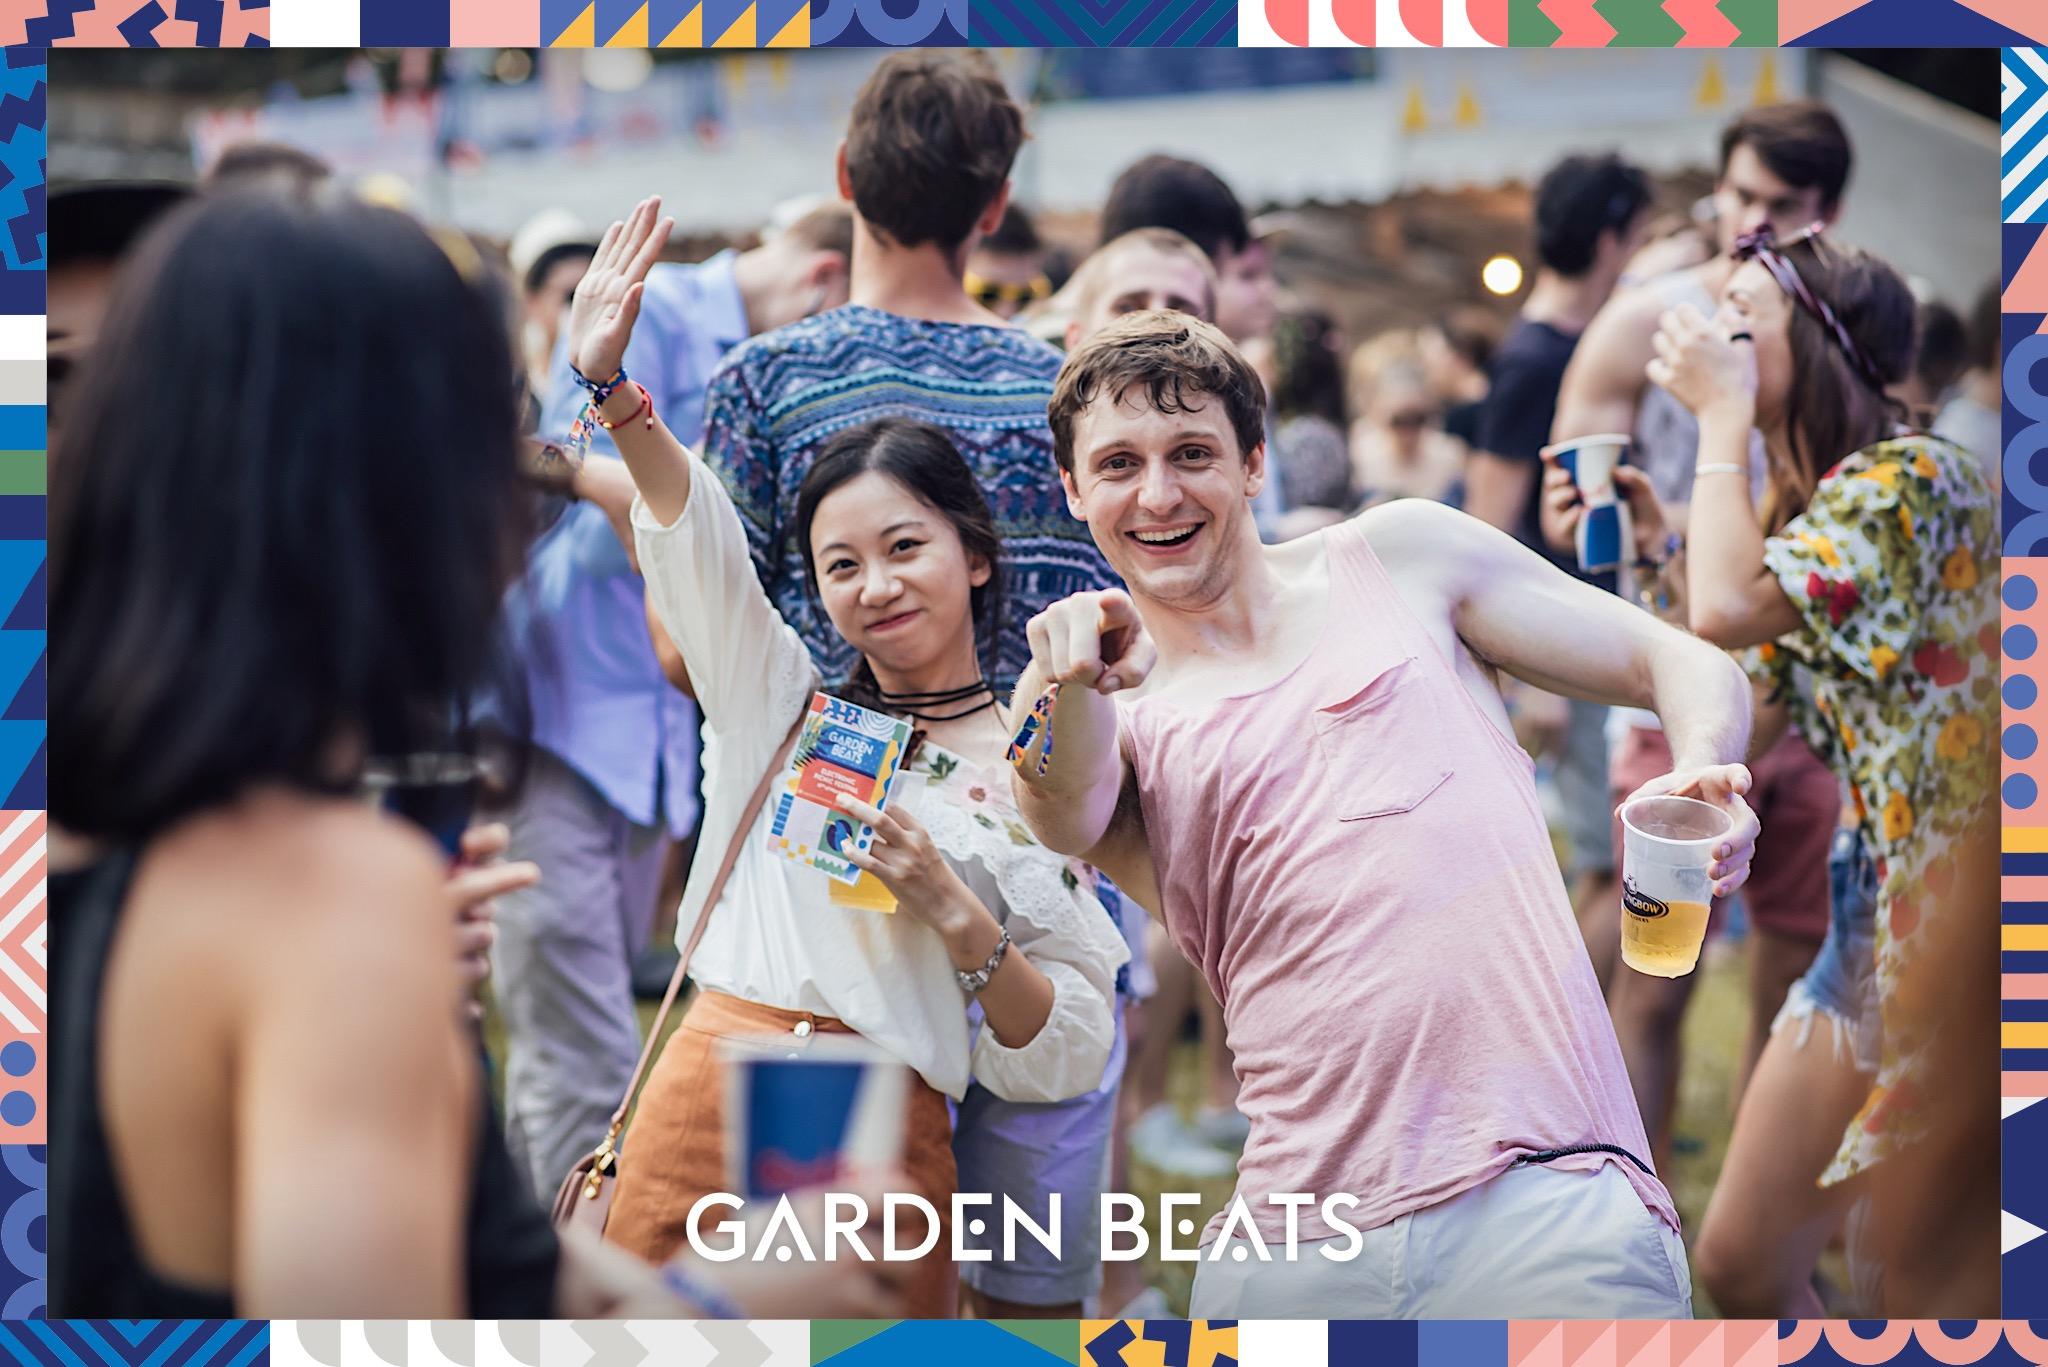 18032017_GardenBeats_Colossal581_WatermarkedGB.jpg